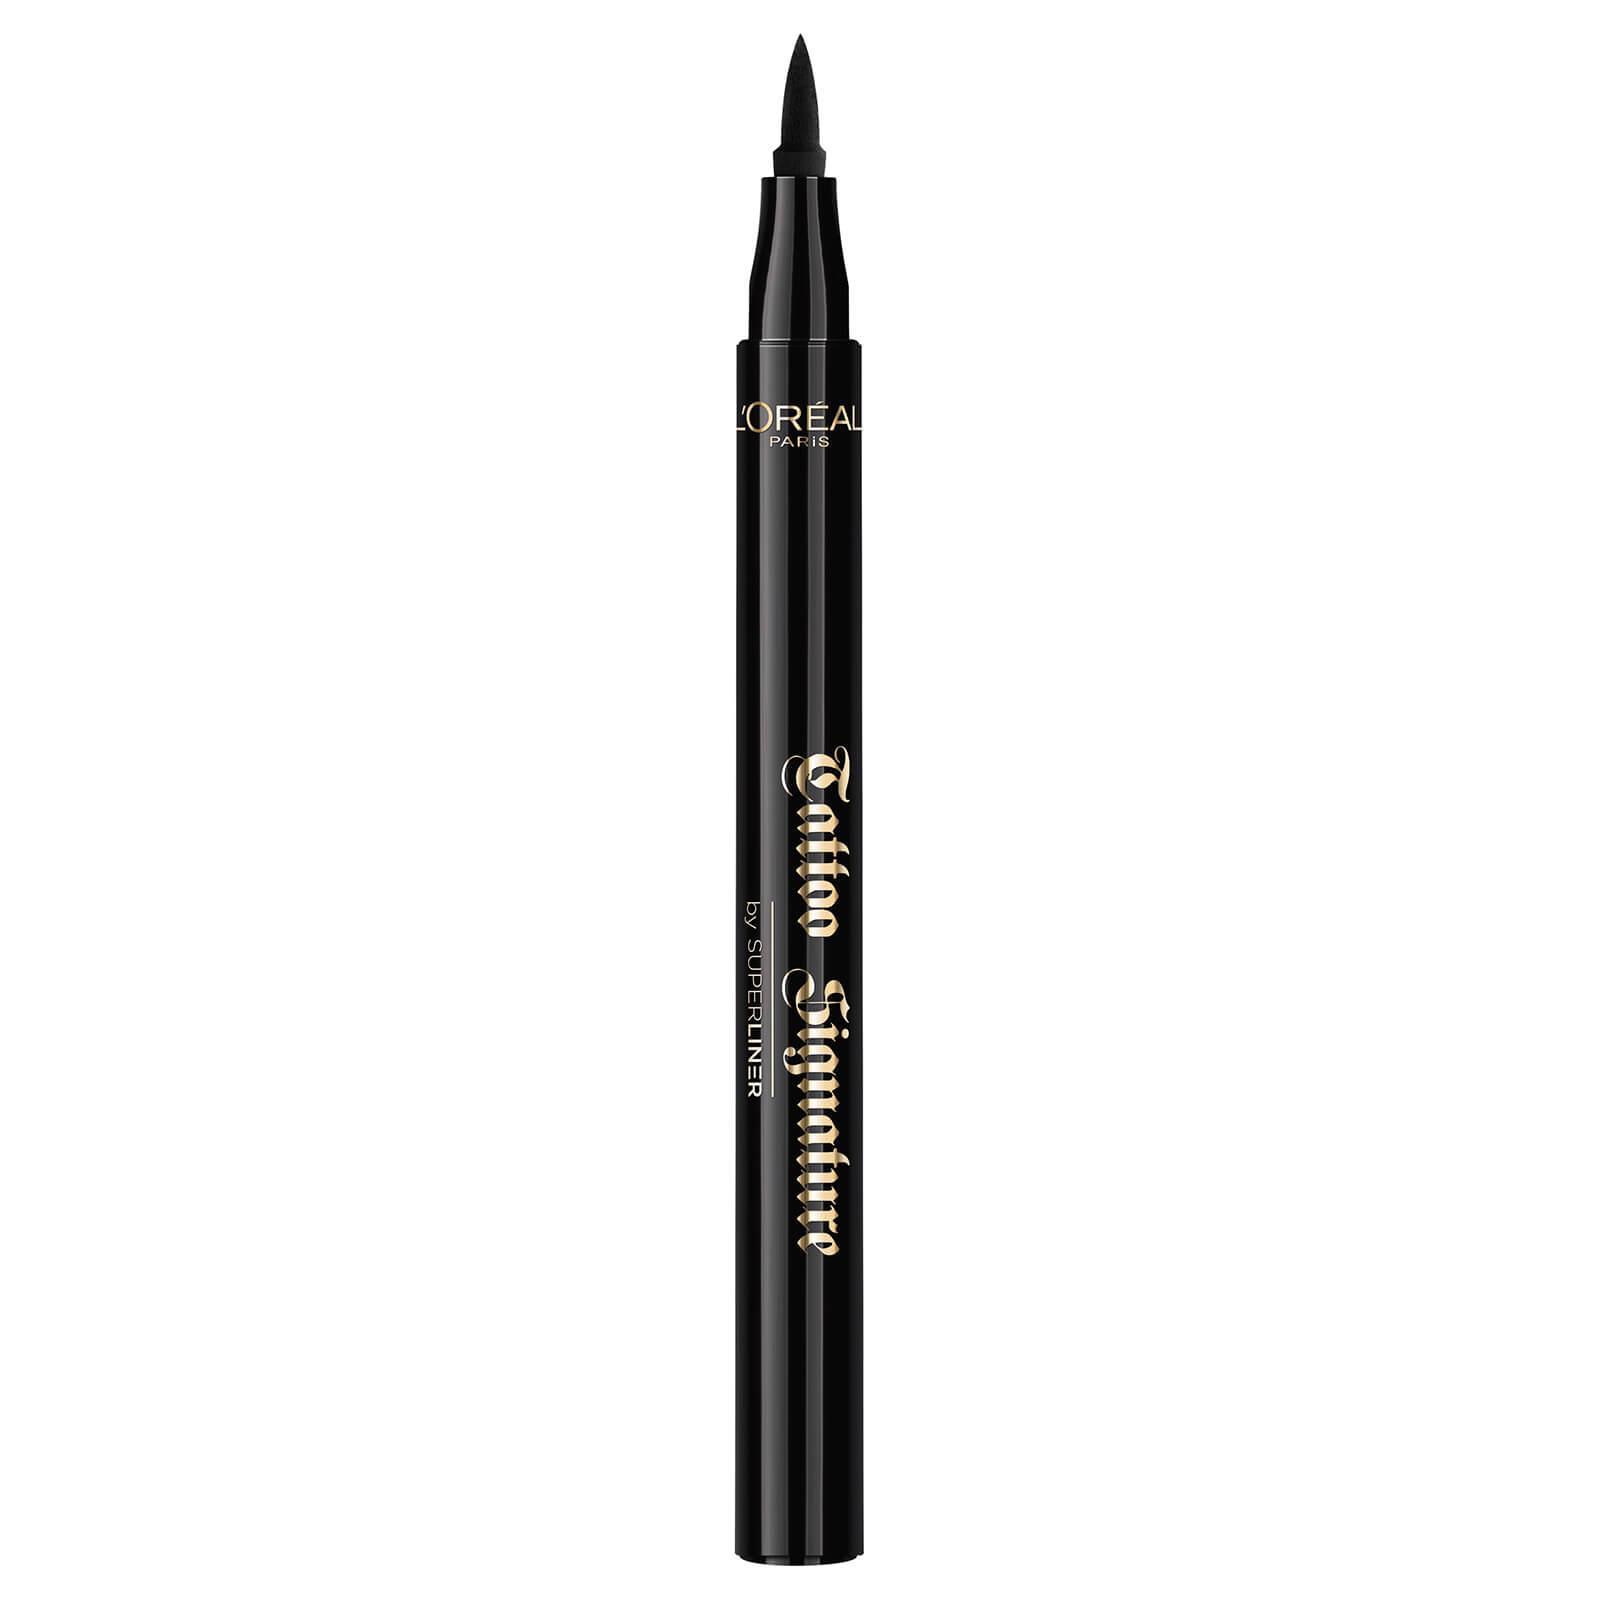 L'Oréal Paris Tattoo Signature 24HR Liquid Eyeliner - 01 Xtra Black 12ml